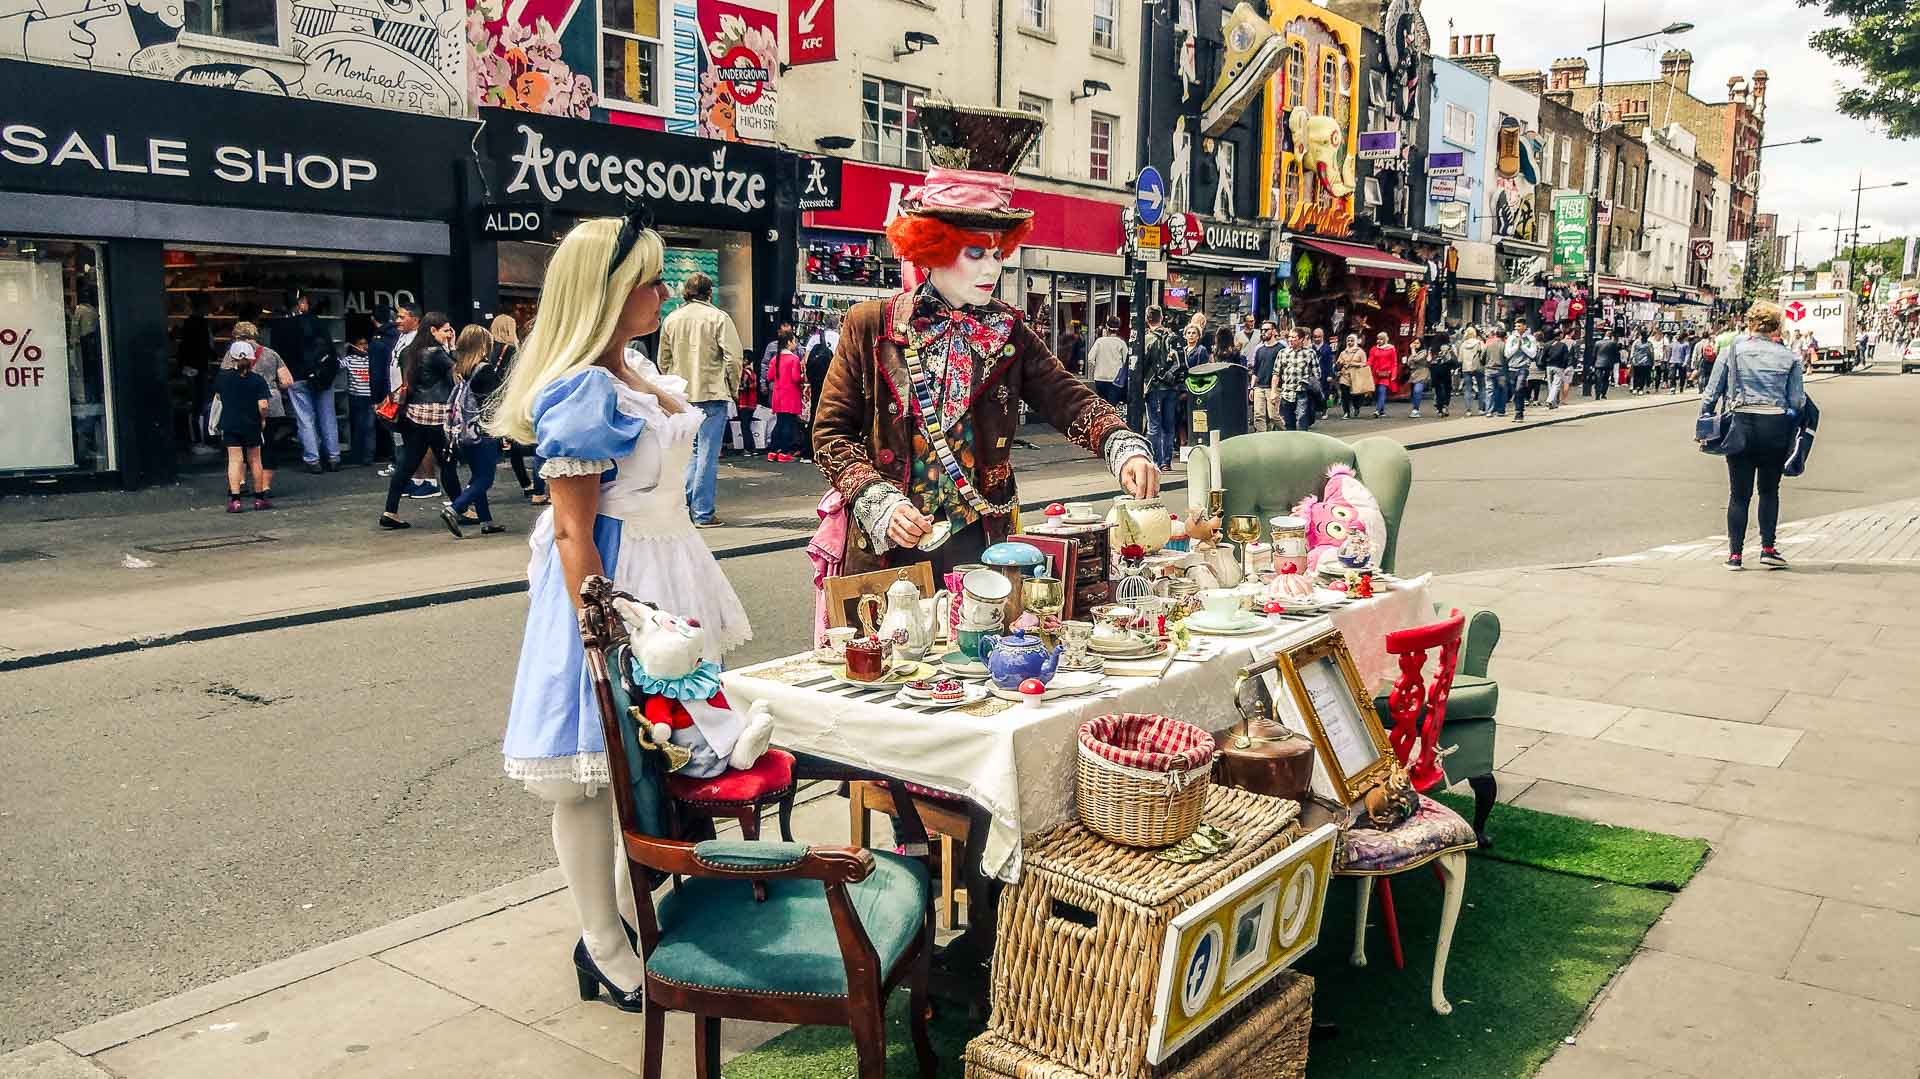 Street artists near Camden Market, London